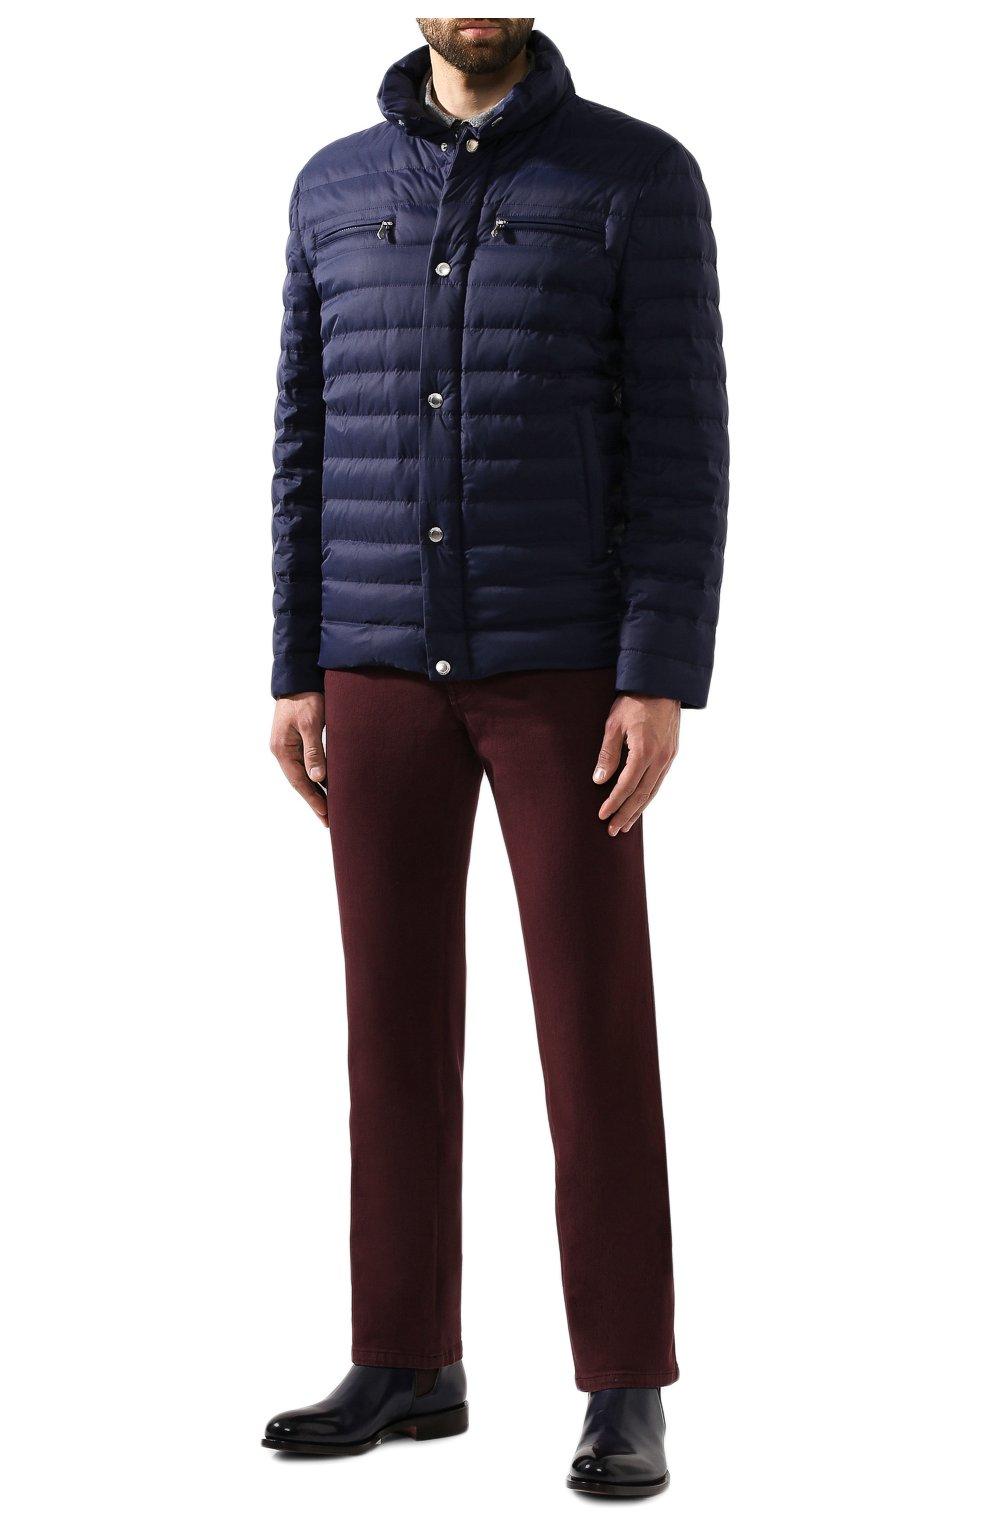 Мужские джинсы BRIONI бордового цвета, арт. SPNJ0M/08T01/STELVI0   Фото 2